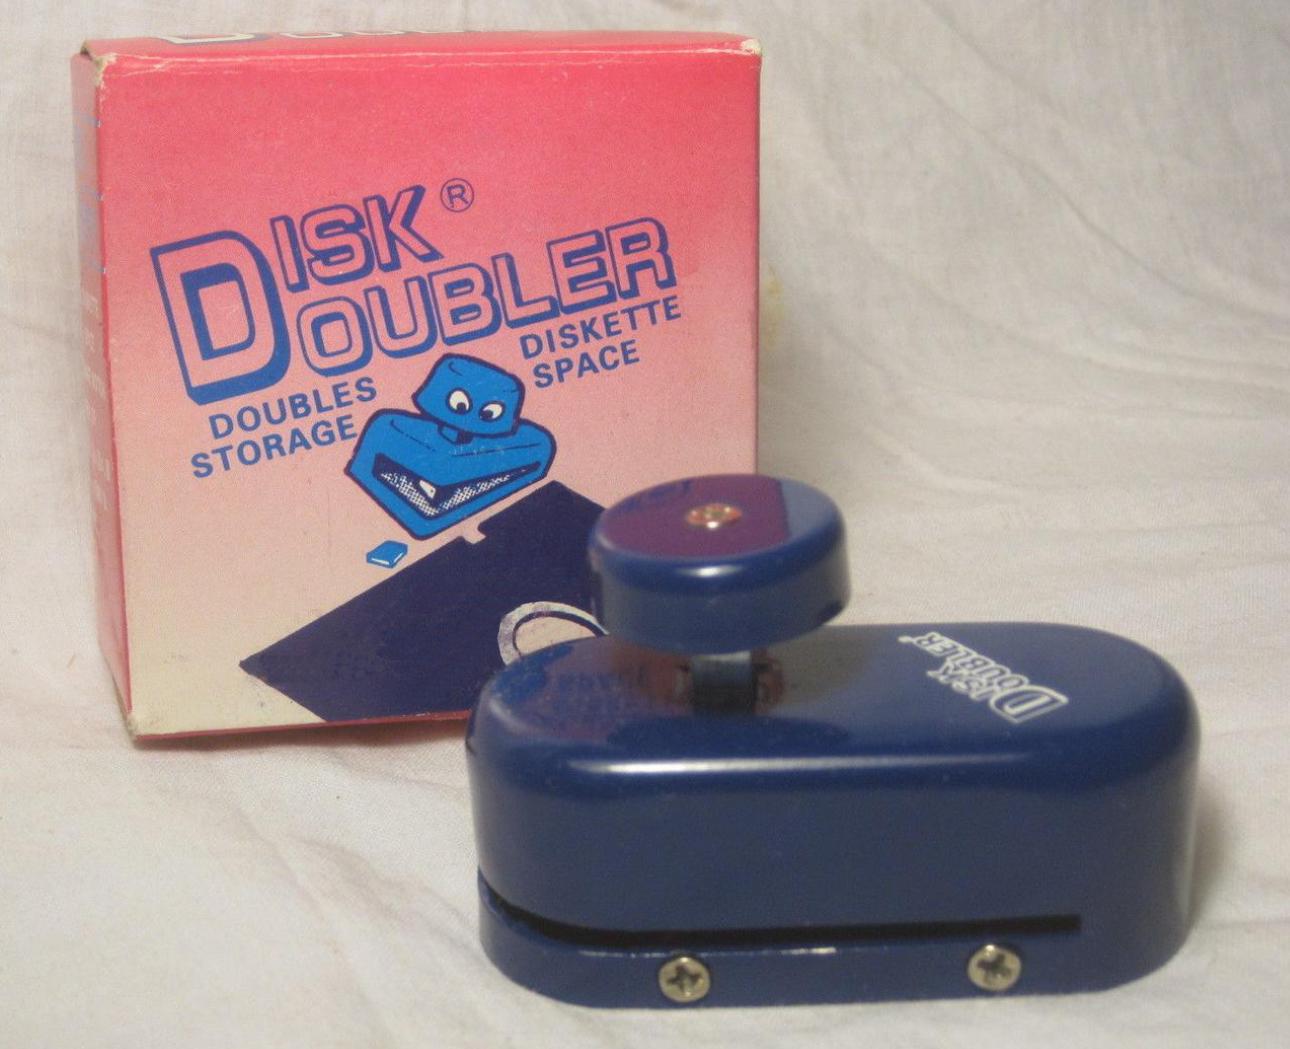 Floppy disk doubler